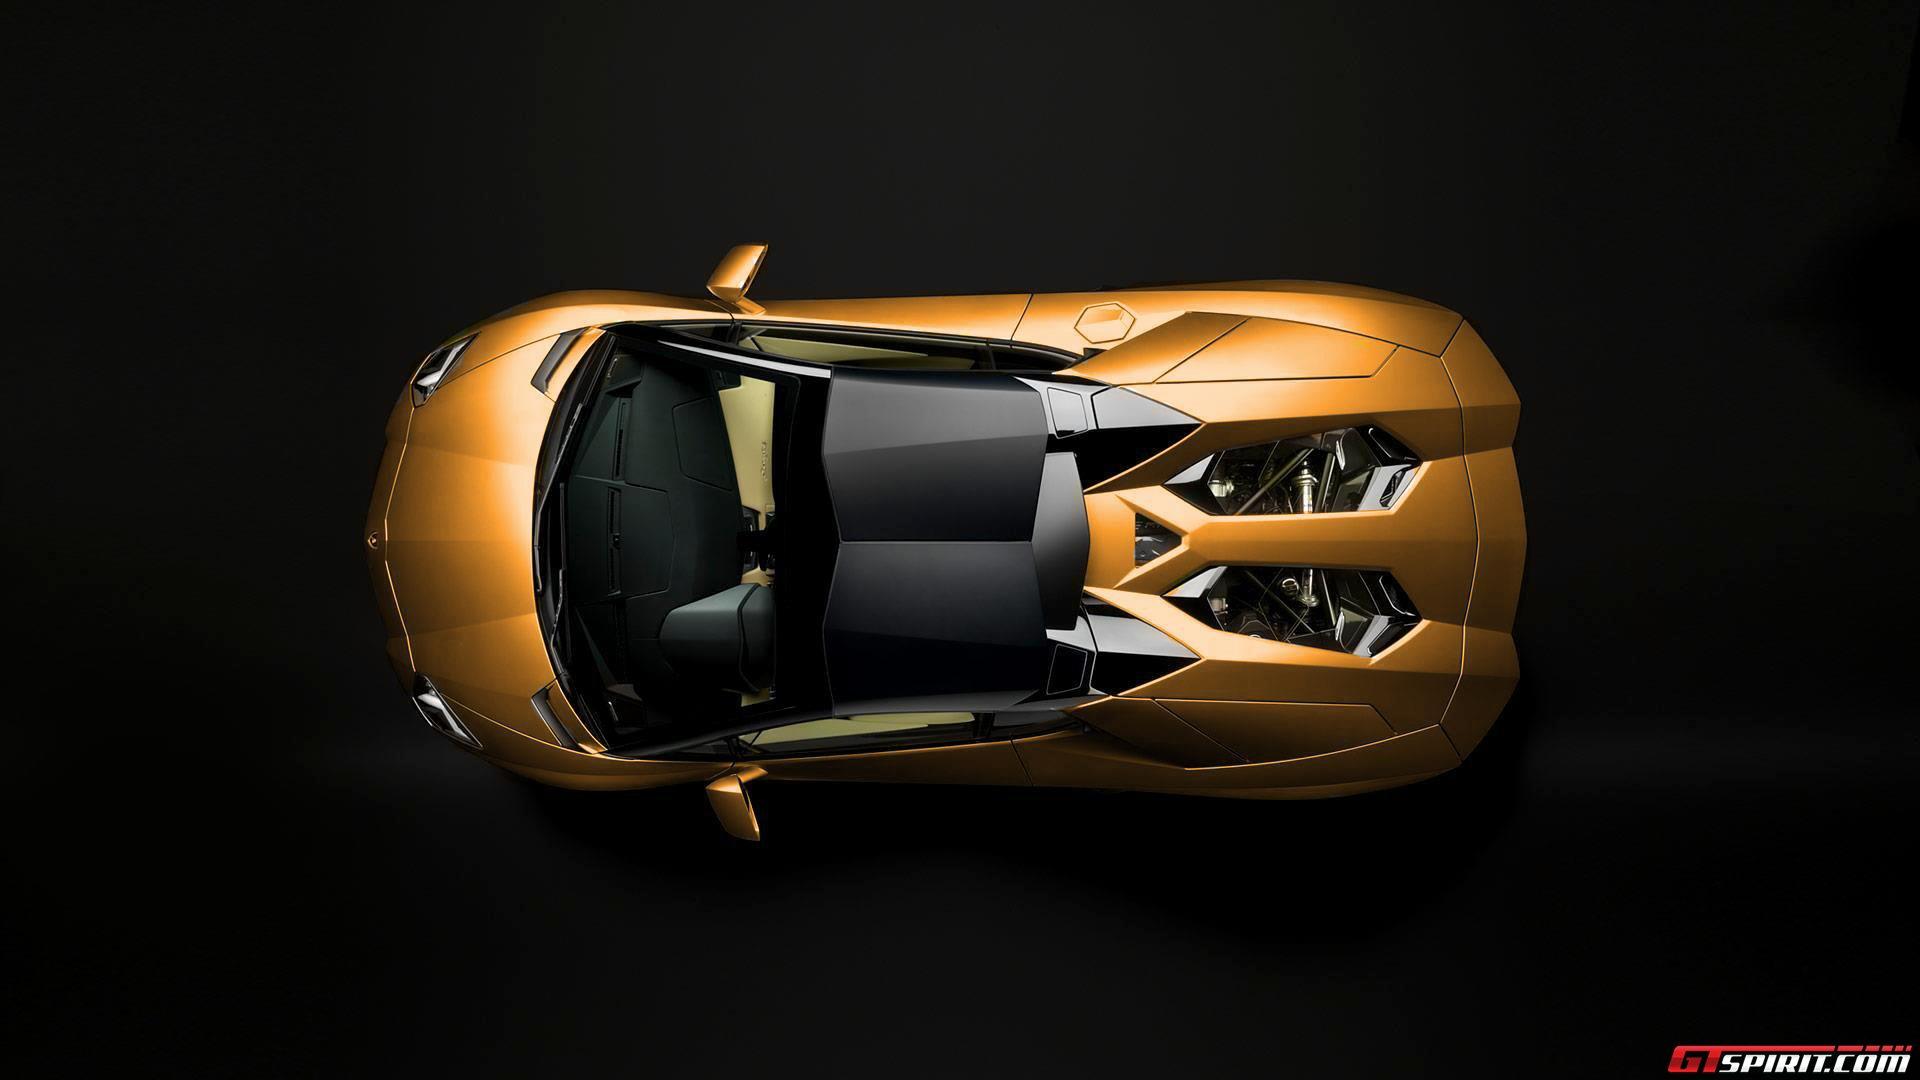 2013 Lamborghini Aventador Roadster Colors Photo 16